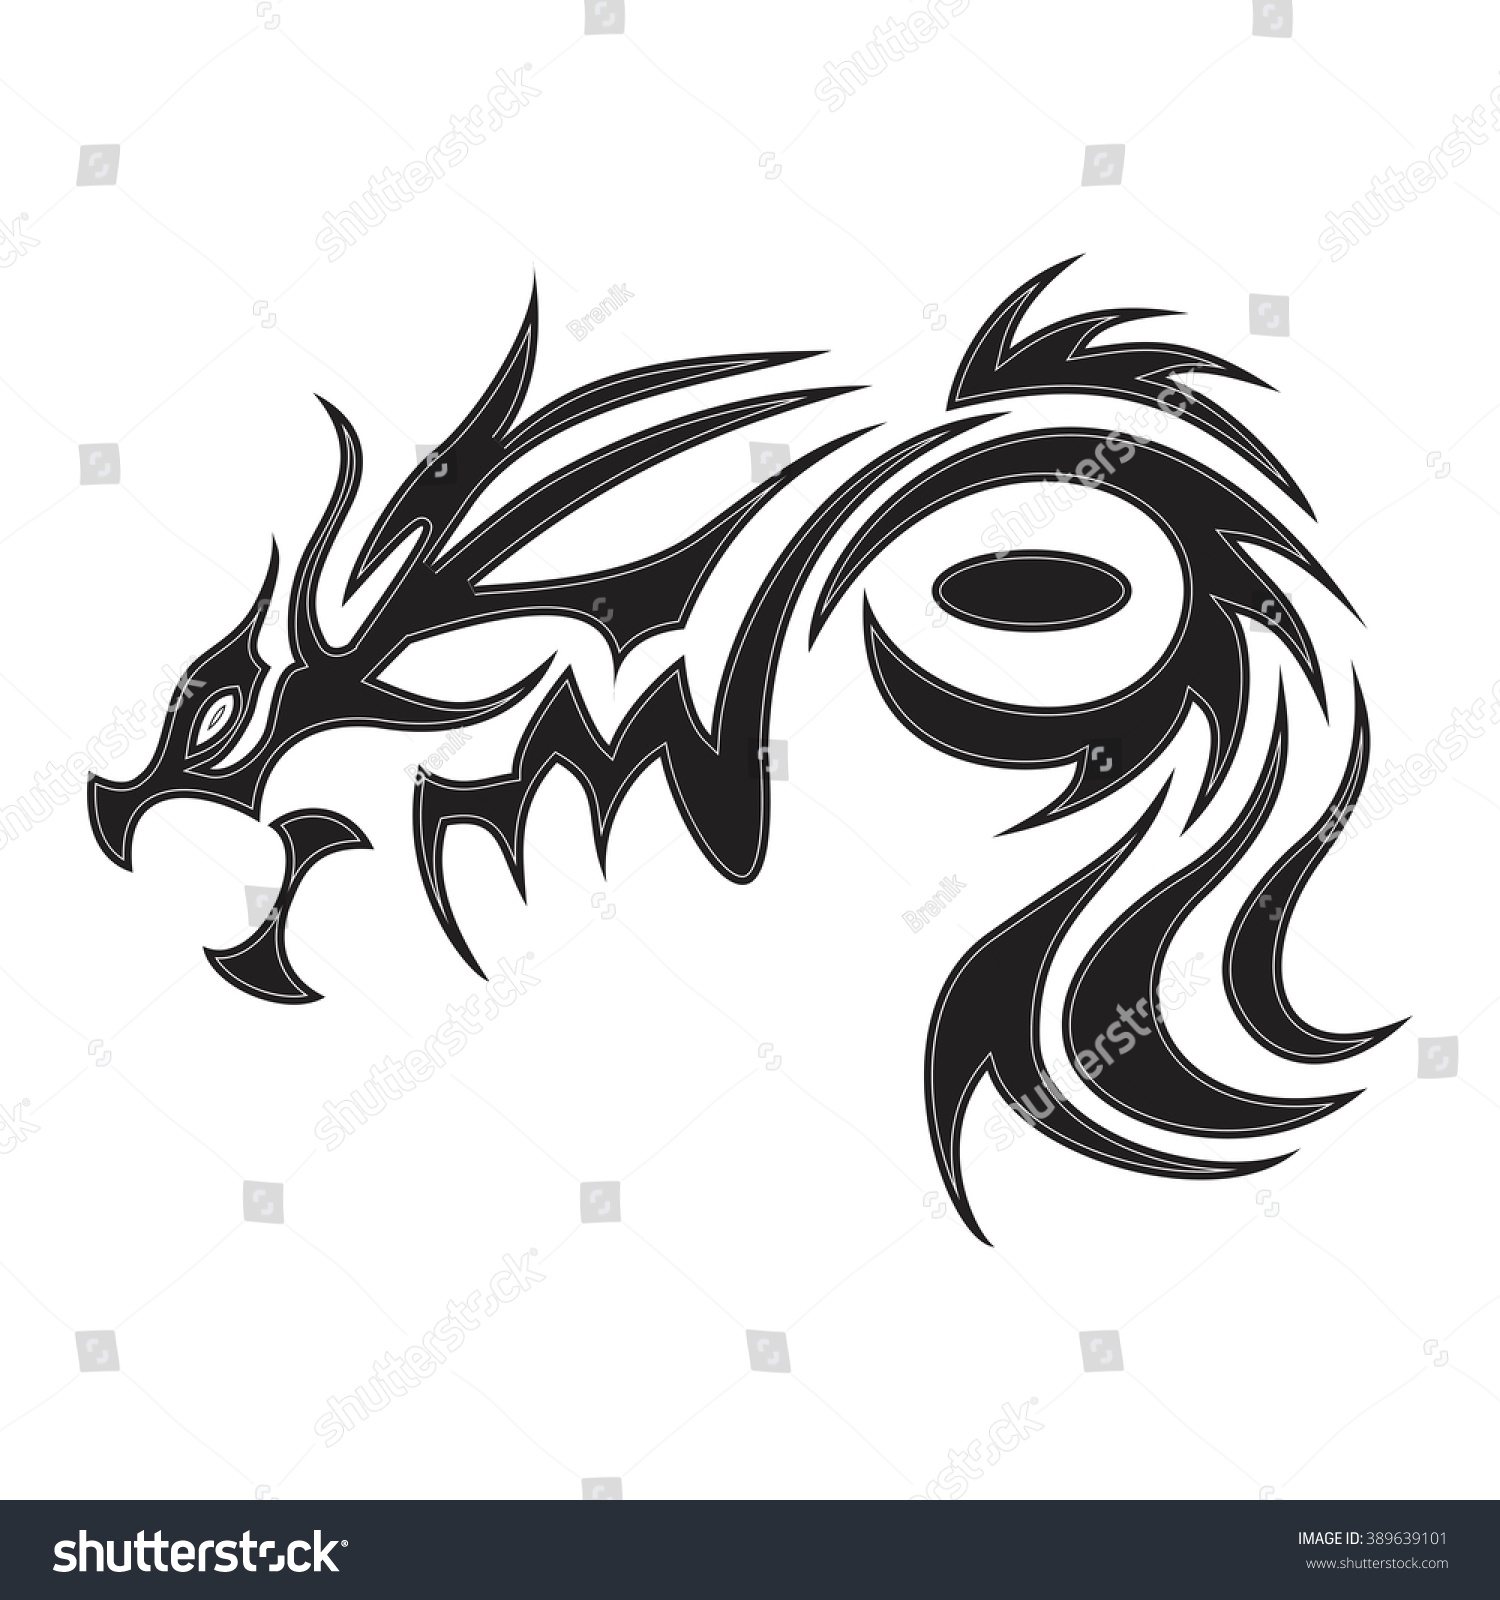 Totem symbol dragon symbol tattoos vector stock vector 389639101 totem symbol of the dragon symbol tattoos vector illustration biocorpaavc Image collections